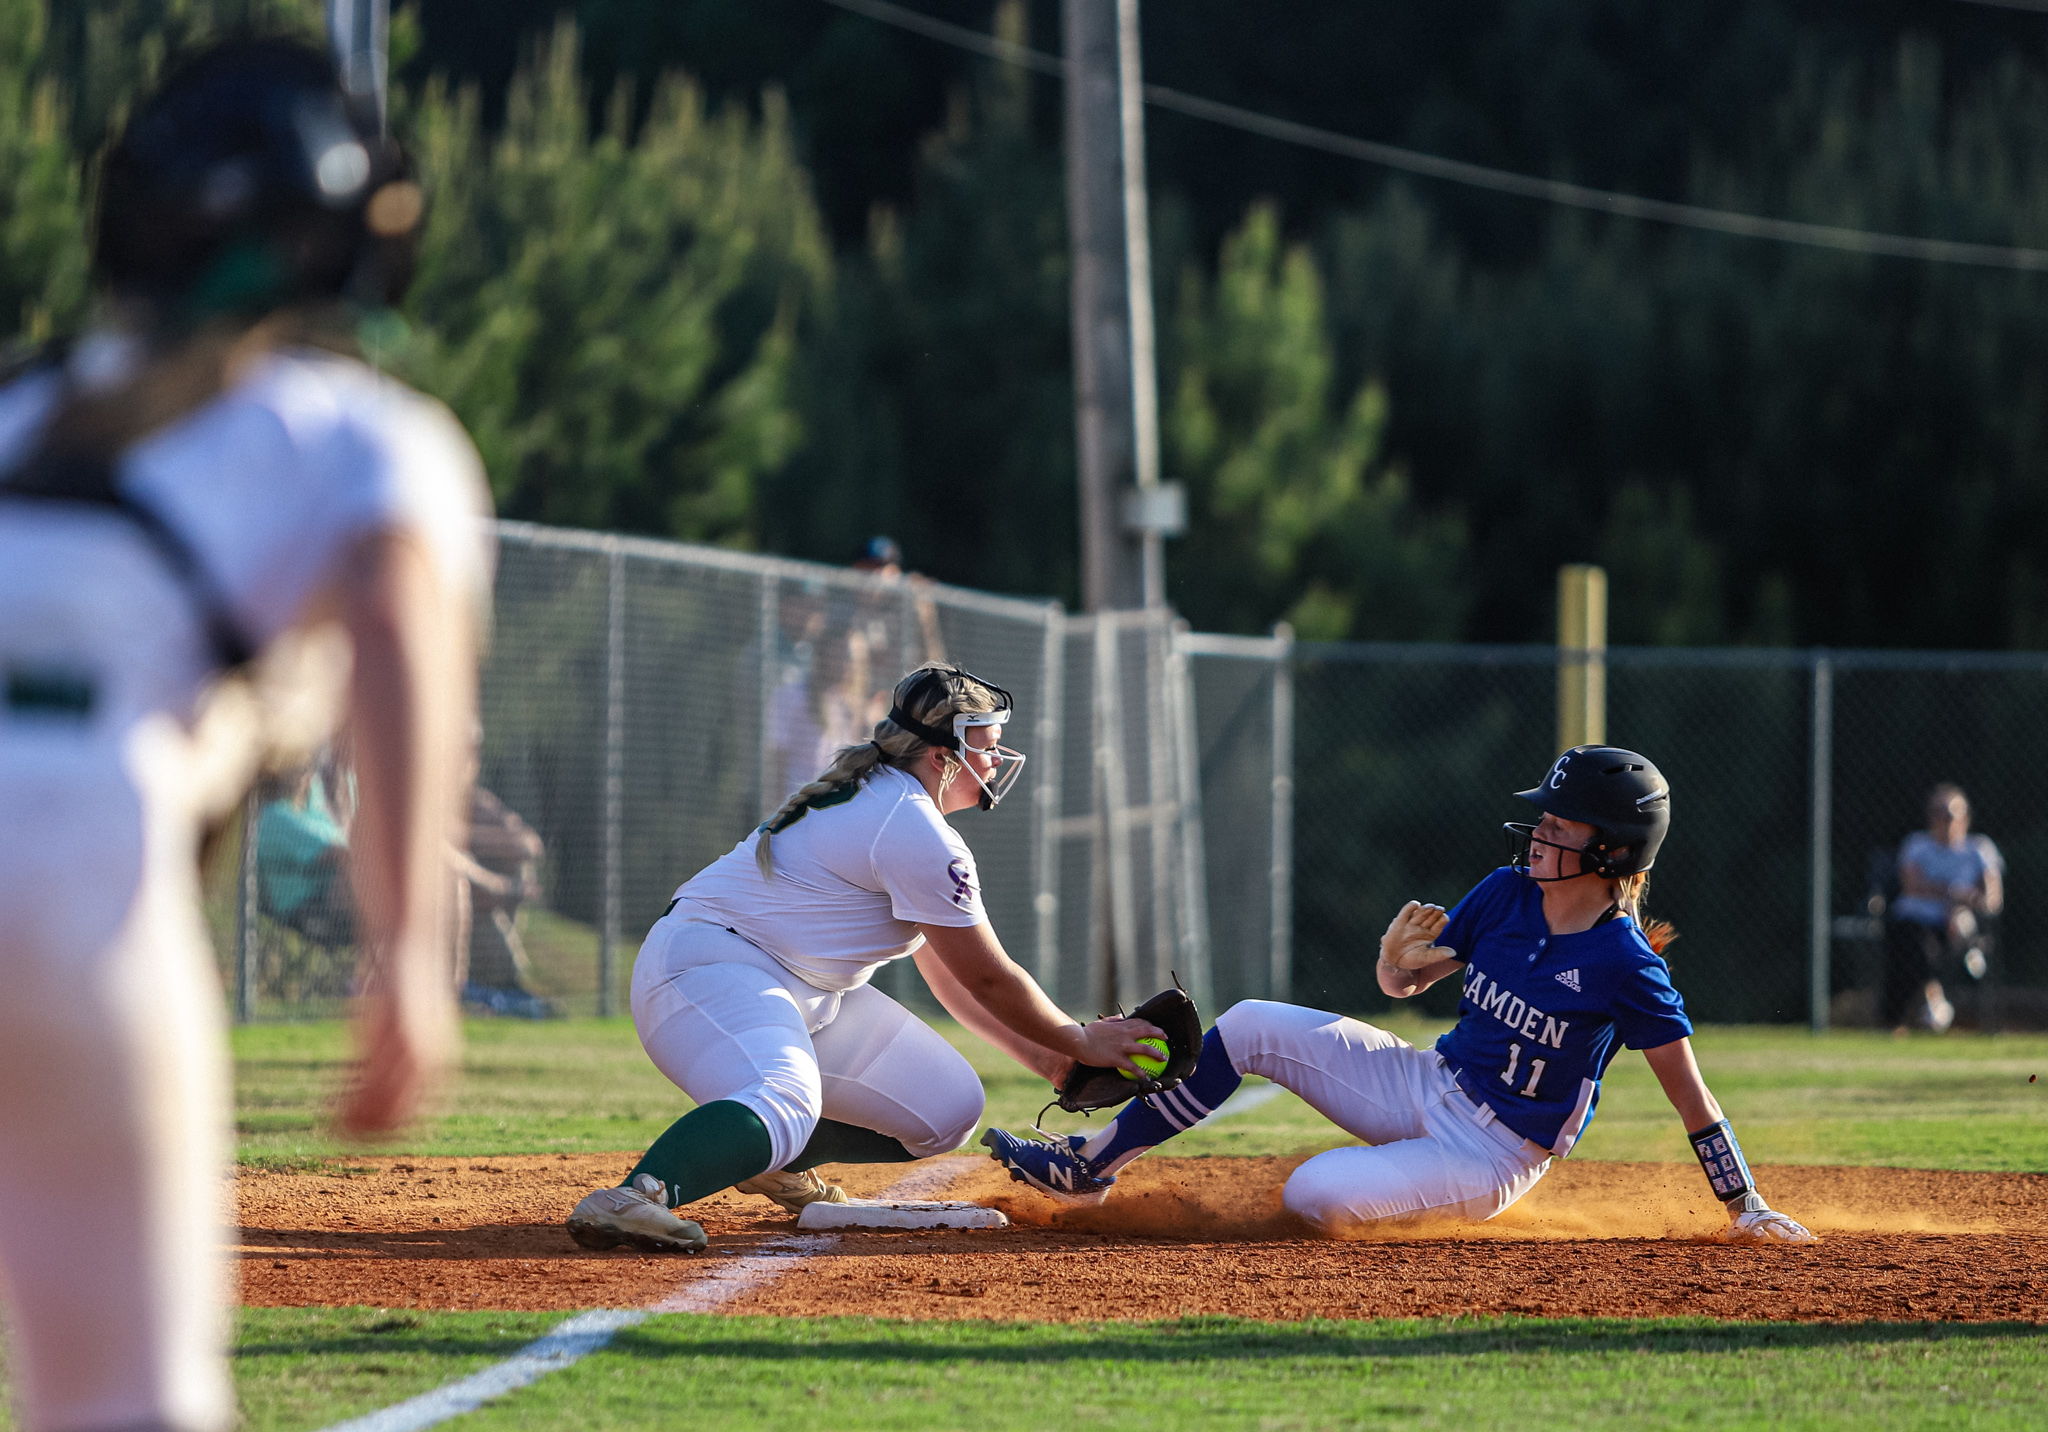 Softball: North Duplin's Season Comes To An End (PHOTO GALLERY)